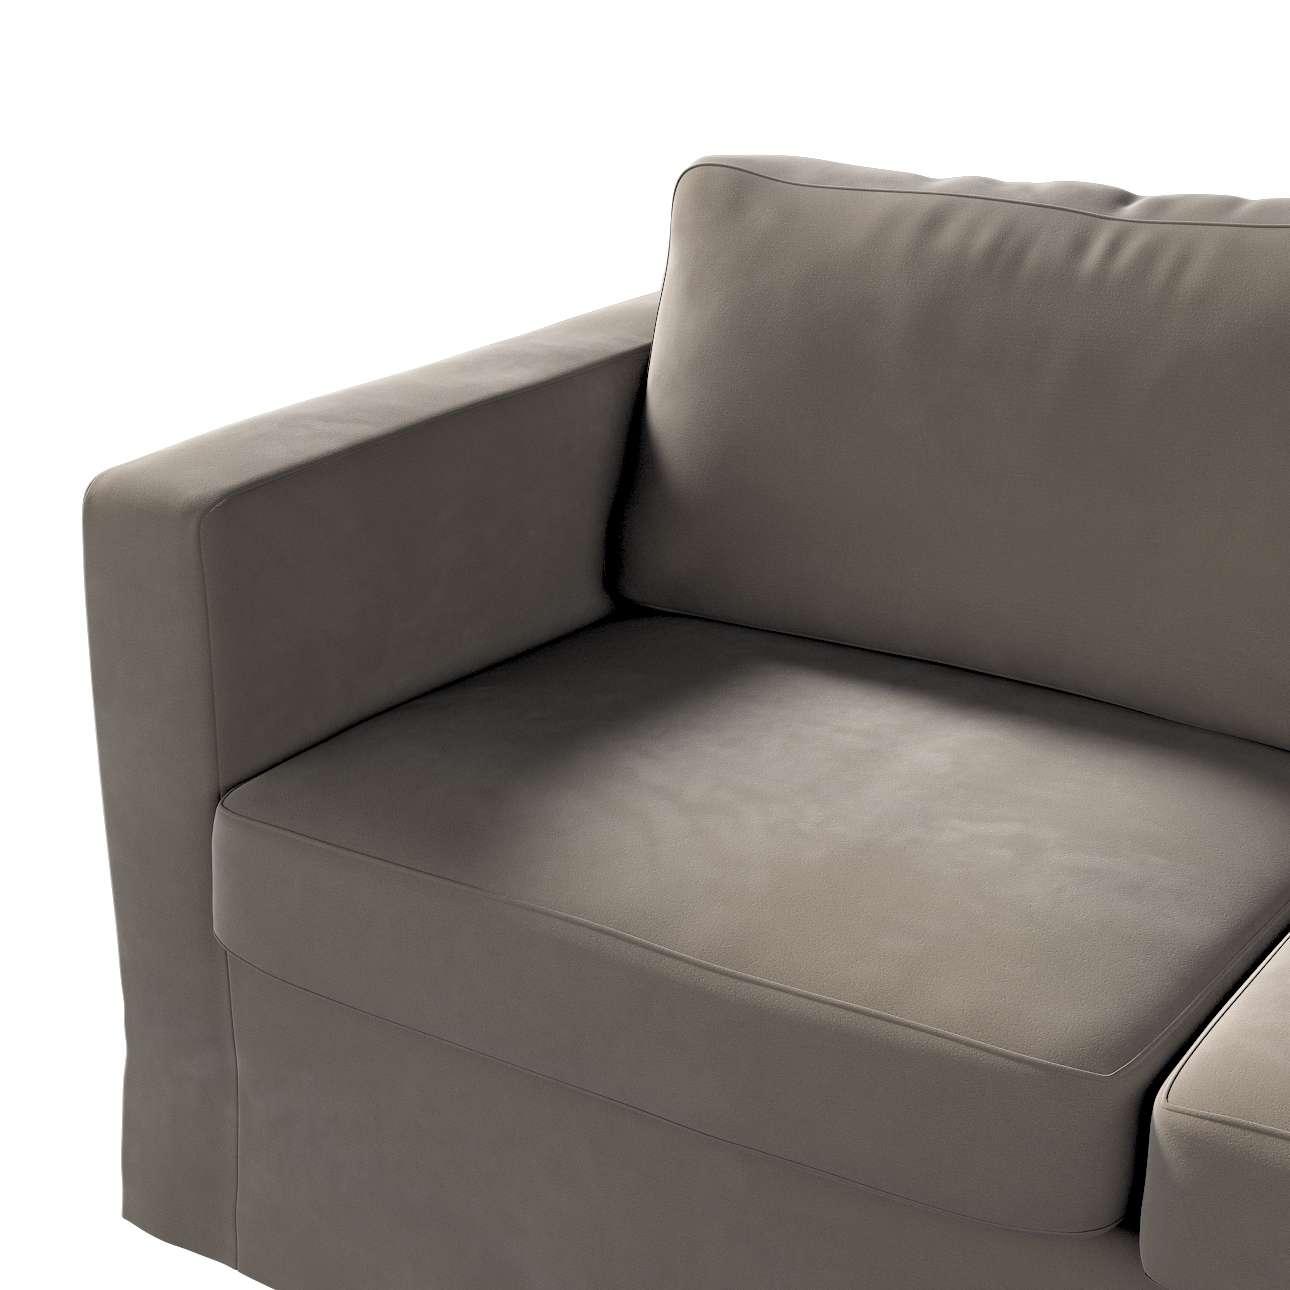 Floor length Karlstad 2-seater sofa cover in collection Velvet, fabric: 704-19